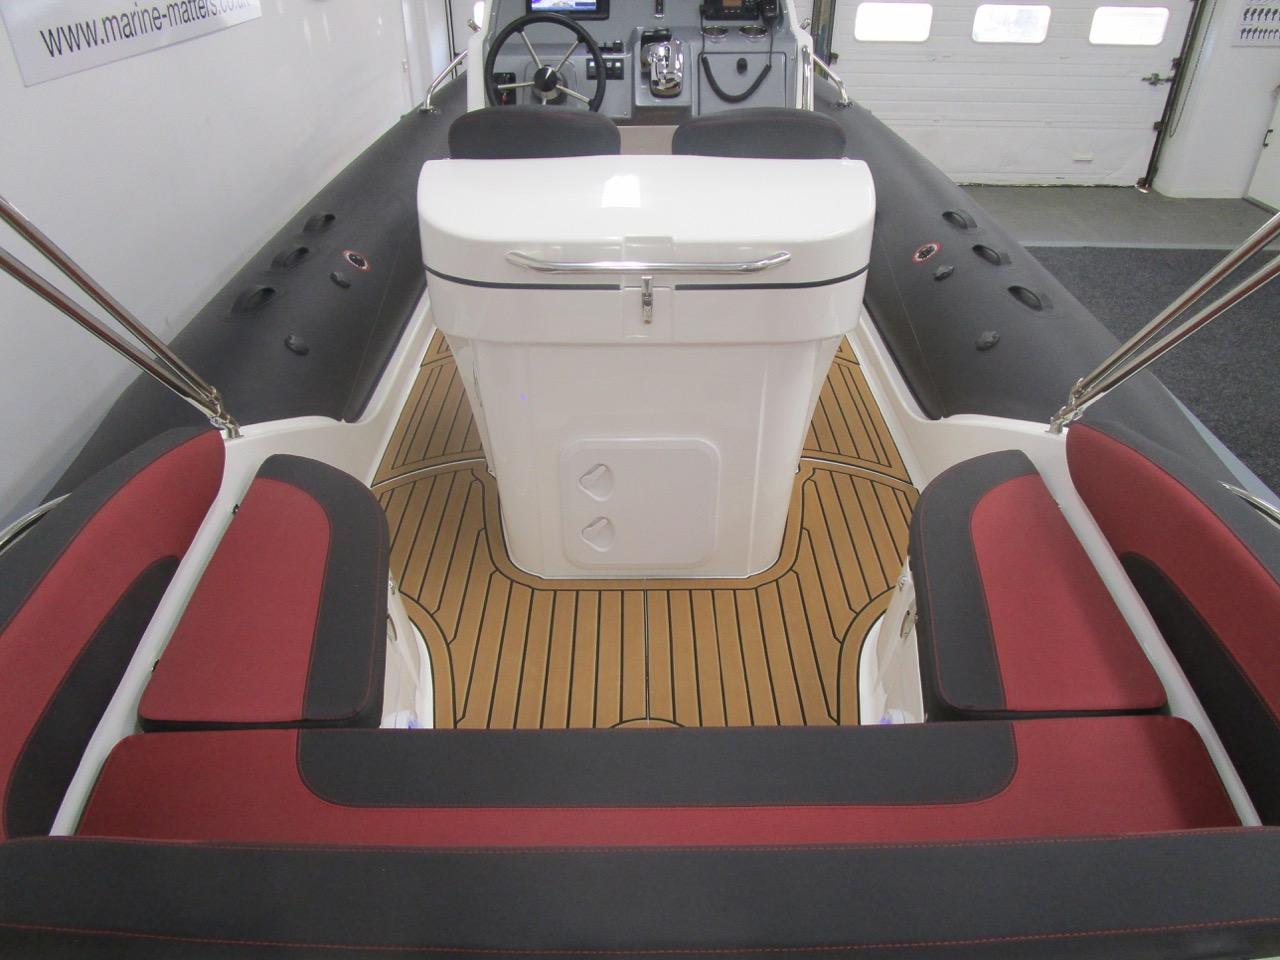 GRAND G850 RIB U-shaped rear seat facing forward